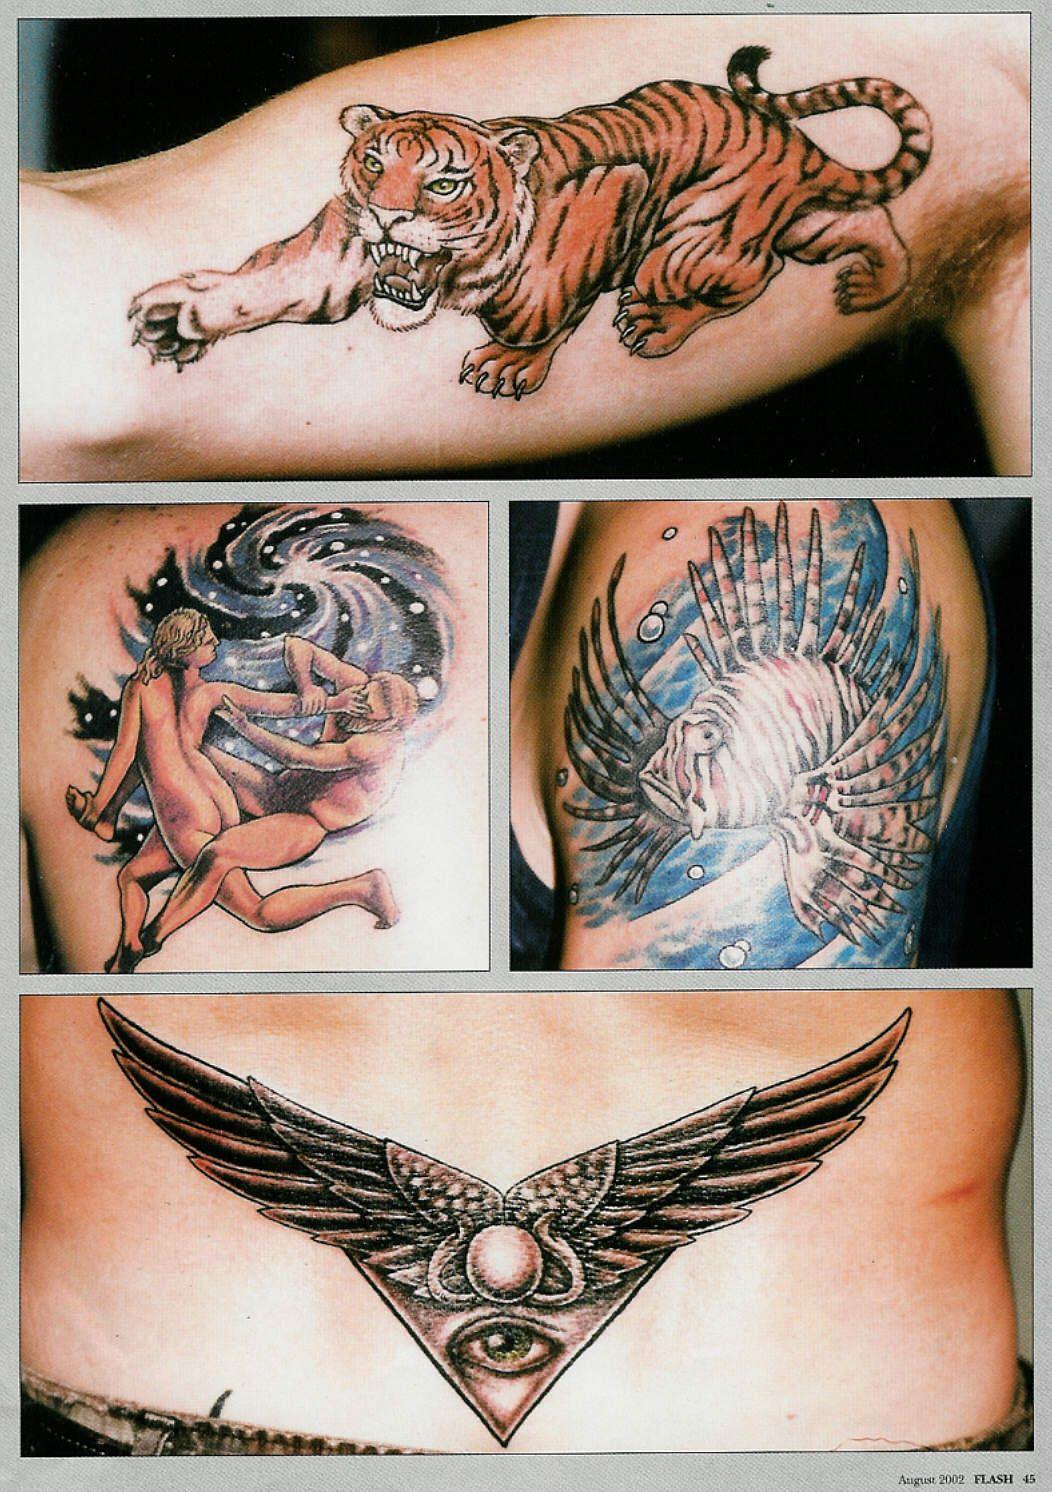 More Articles On Me Erika Stanley's Art & Tattoos Тату